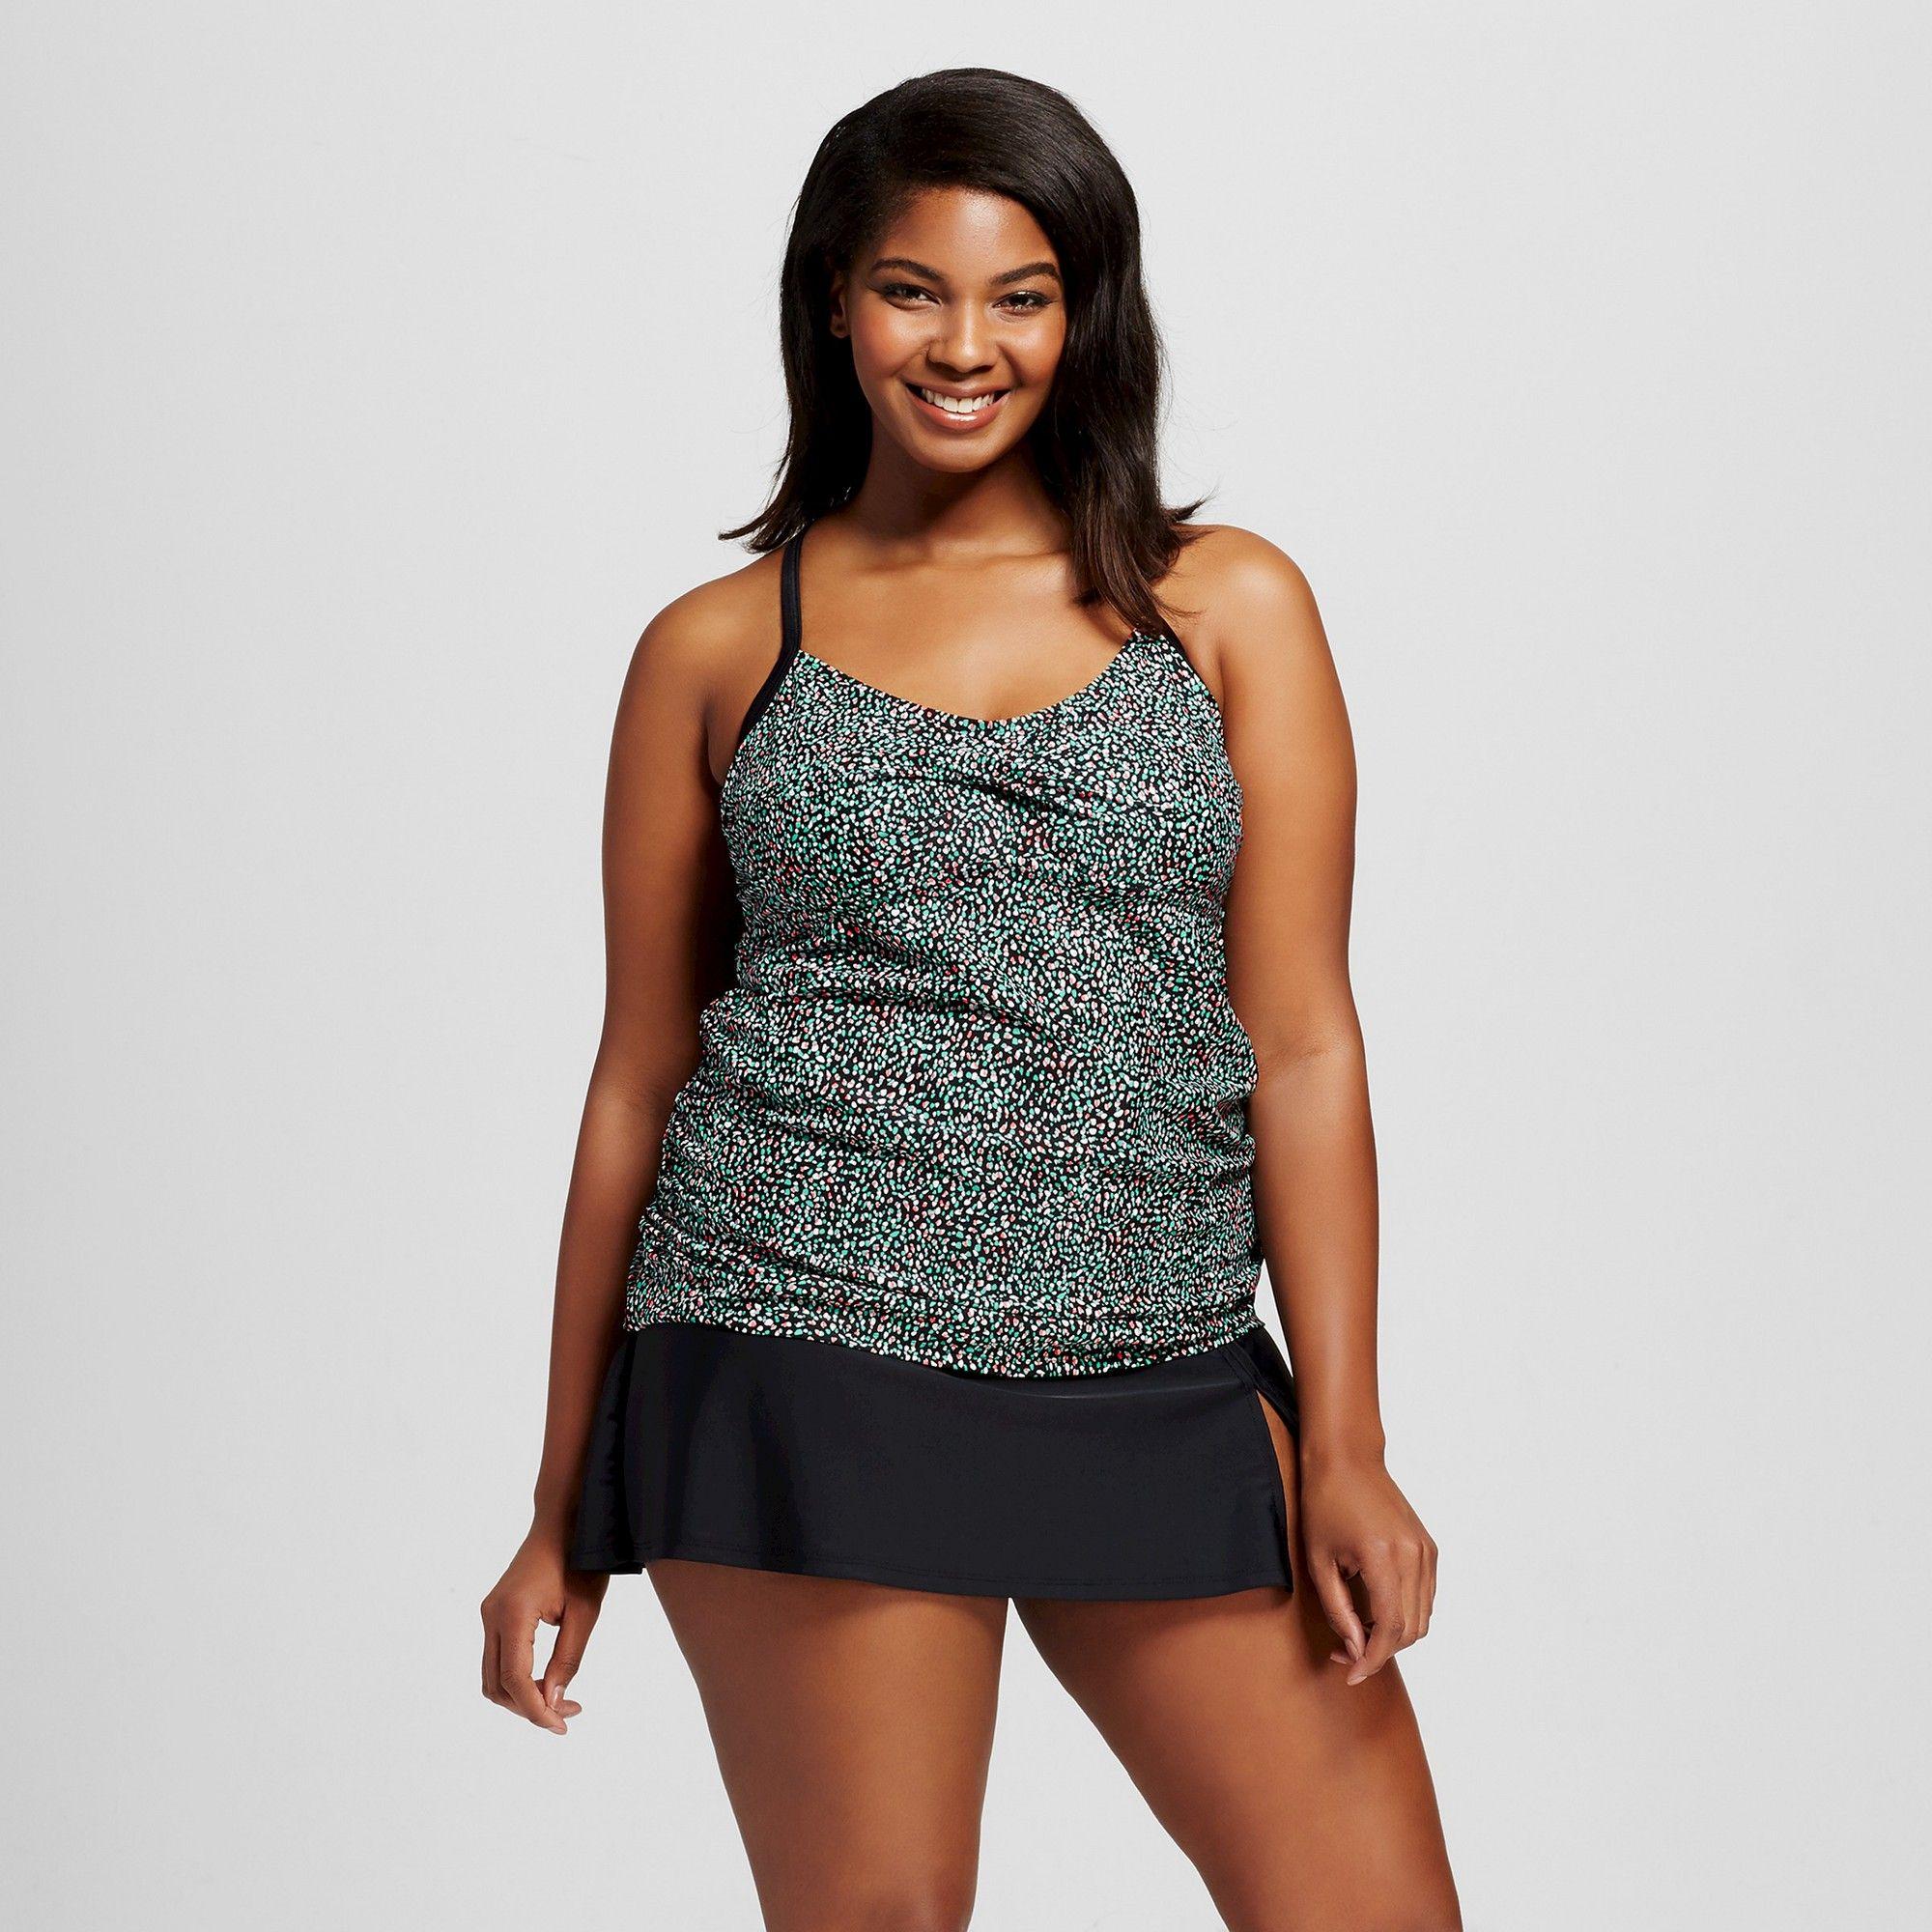 9c4082409431c Women s Plus Size Strappy Halter Tankini - Ava   Viv Scatter Dot 26W ...